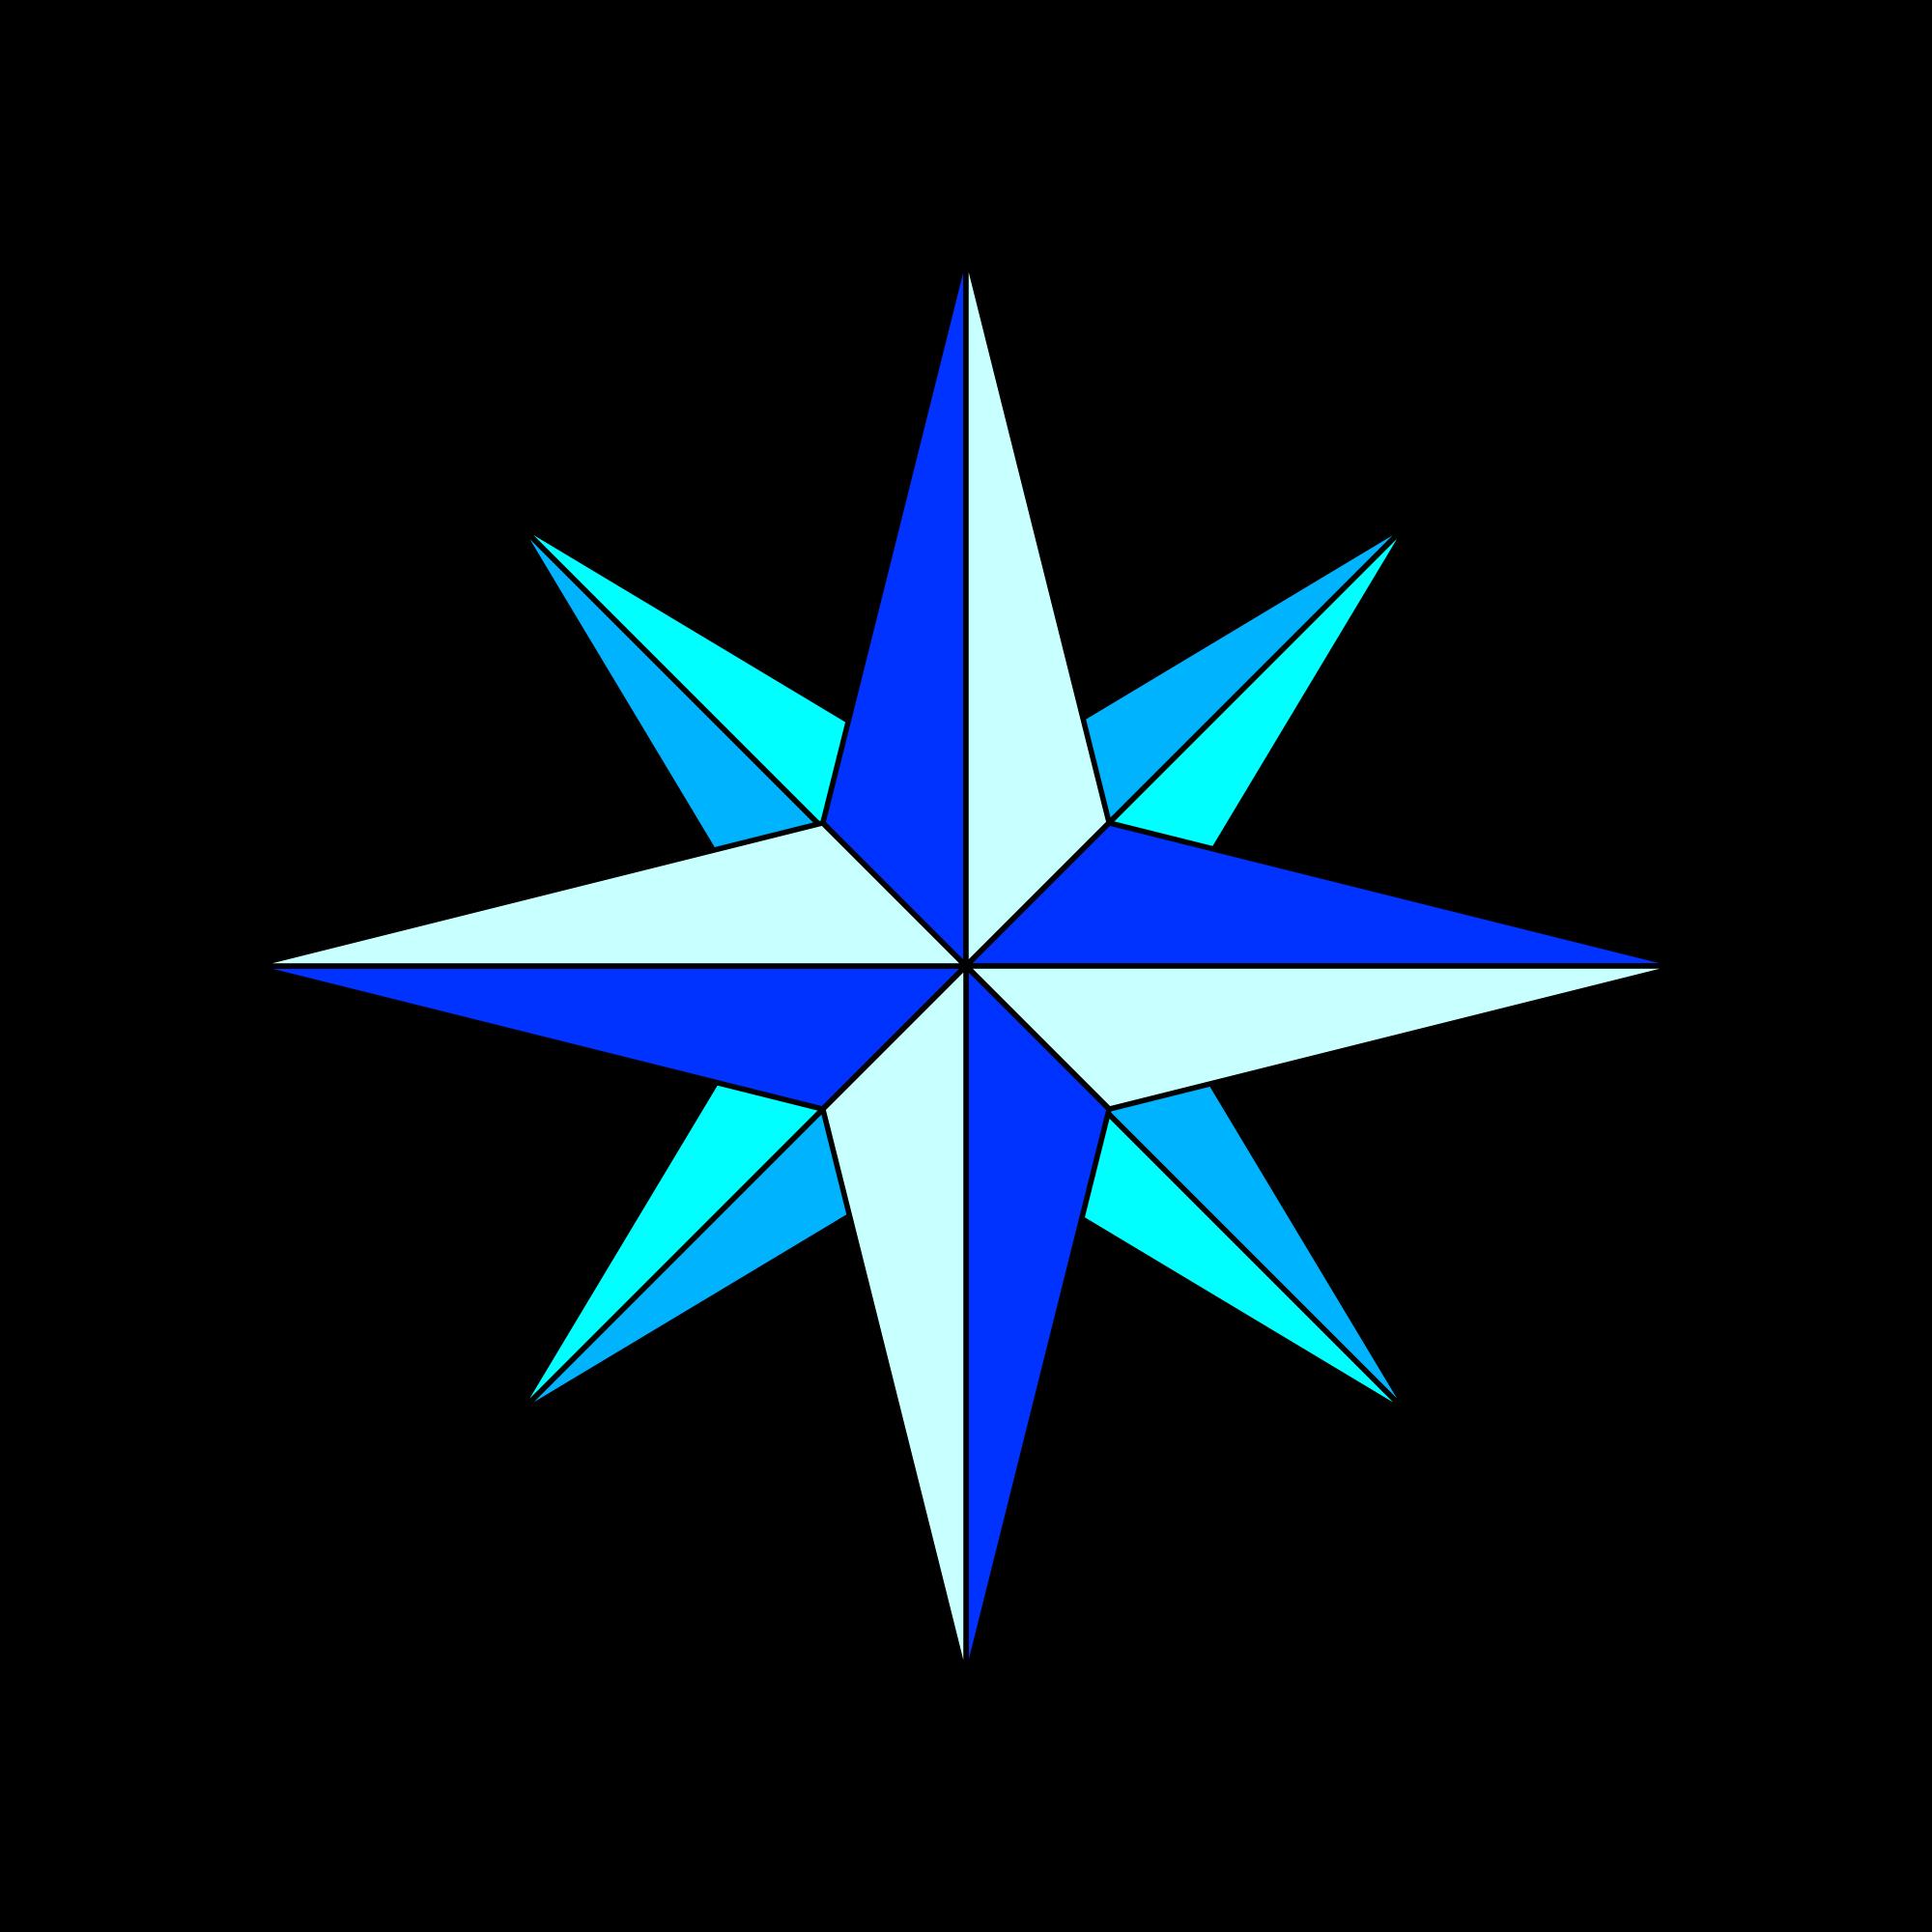 Rose clipart template. Simple compass desktop backgrounds